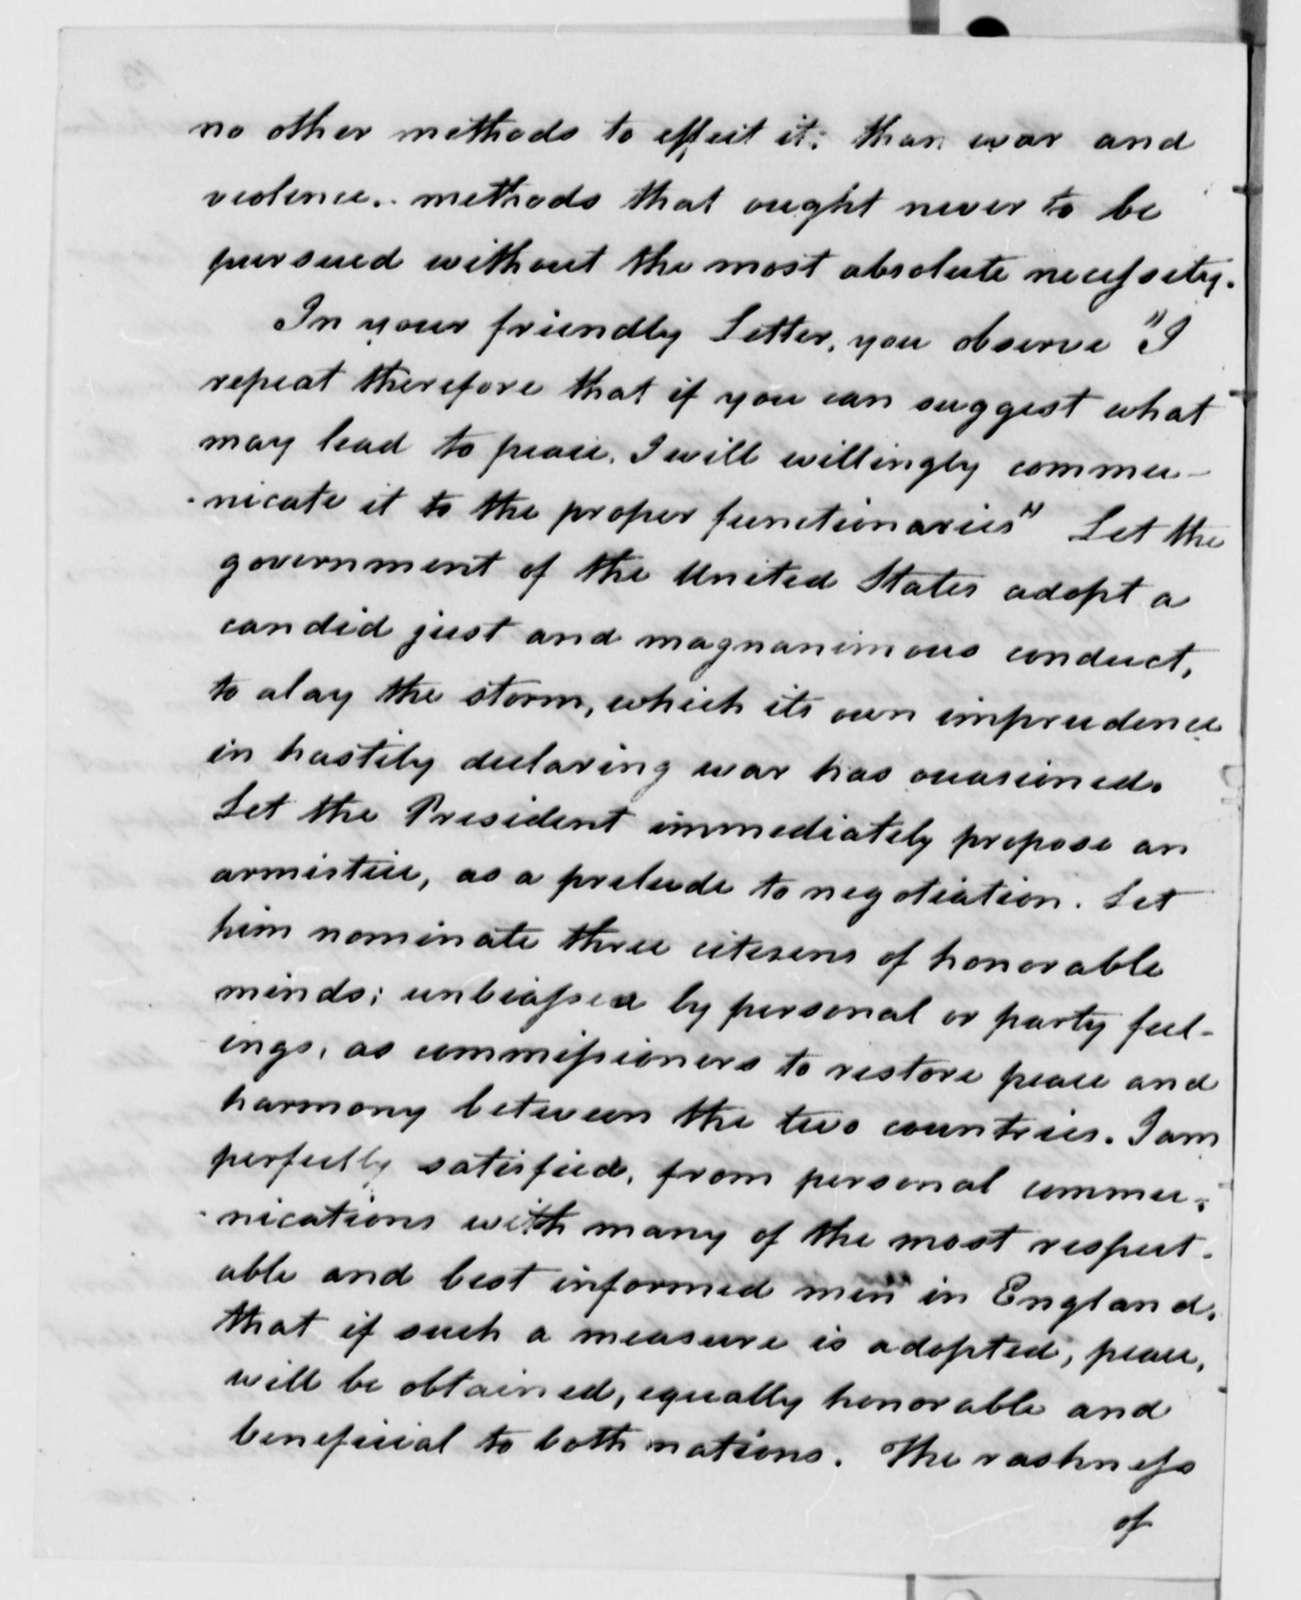 George Logan to Thomas Jefferson, December 9, 1813